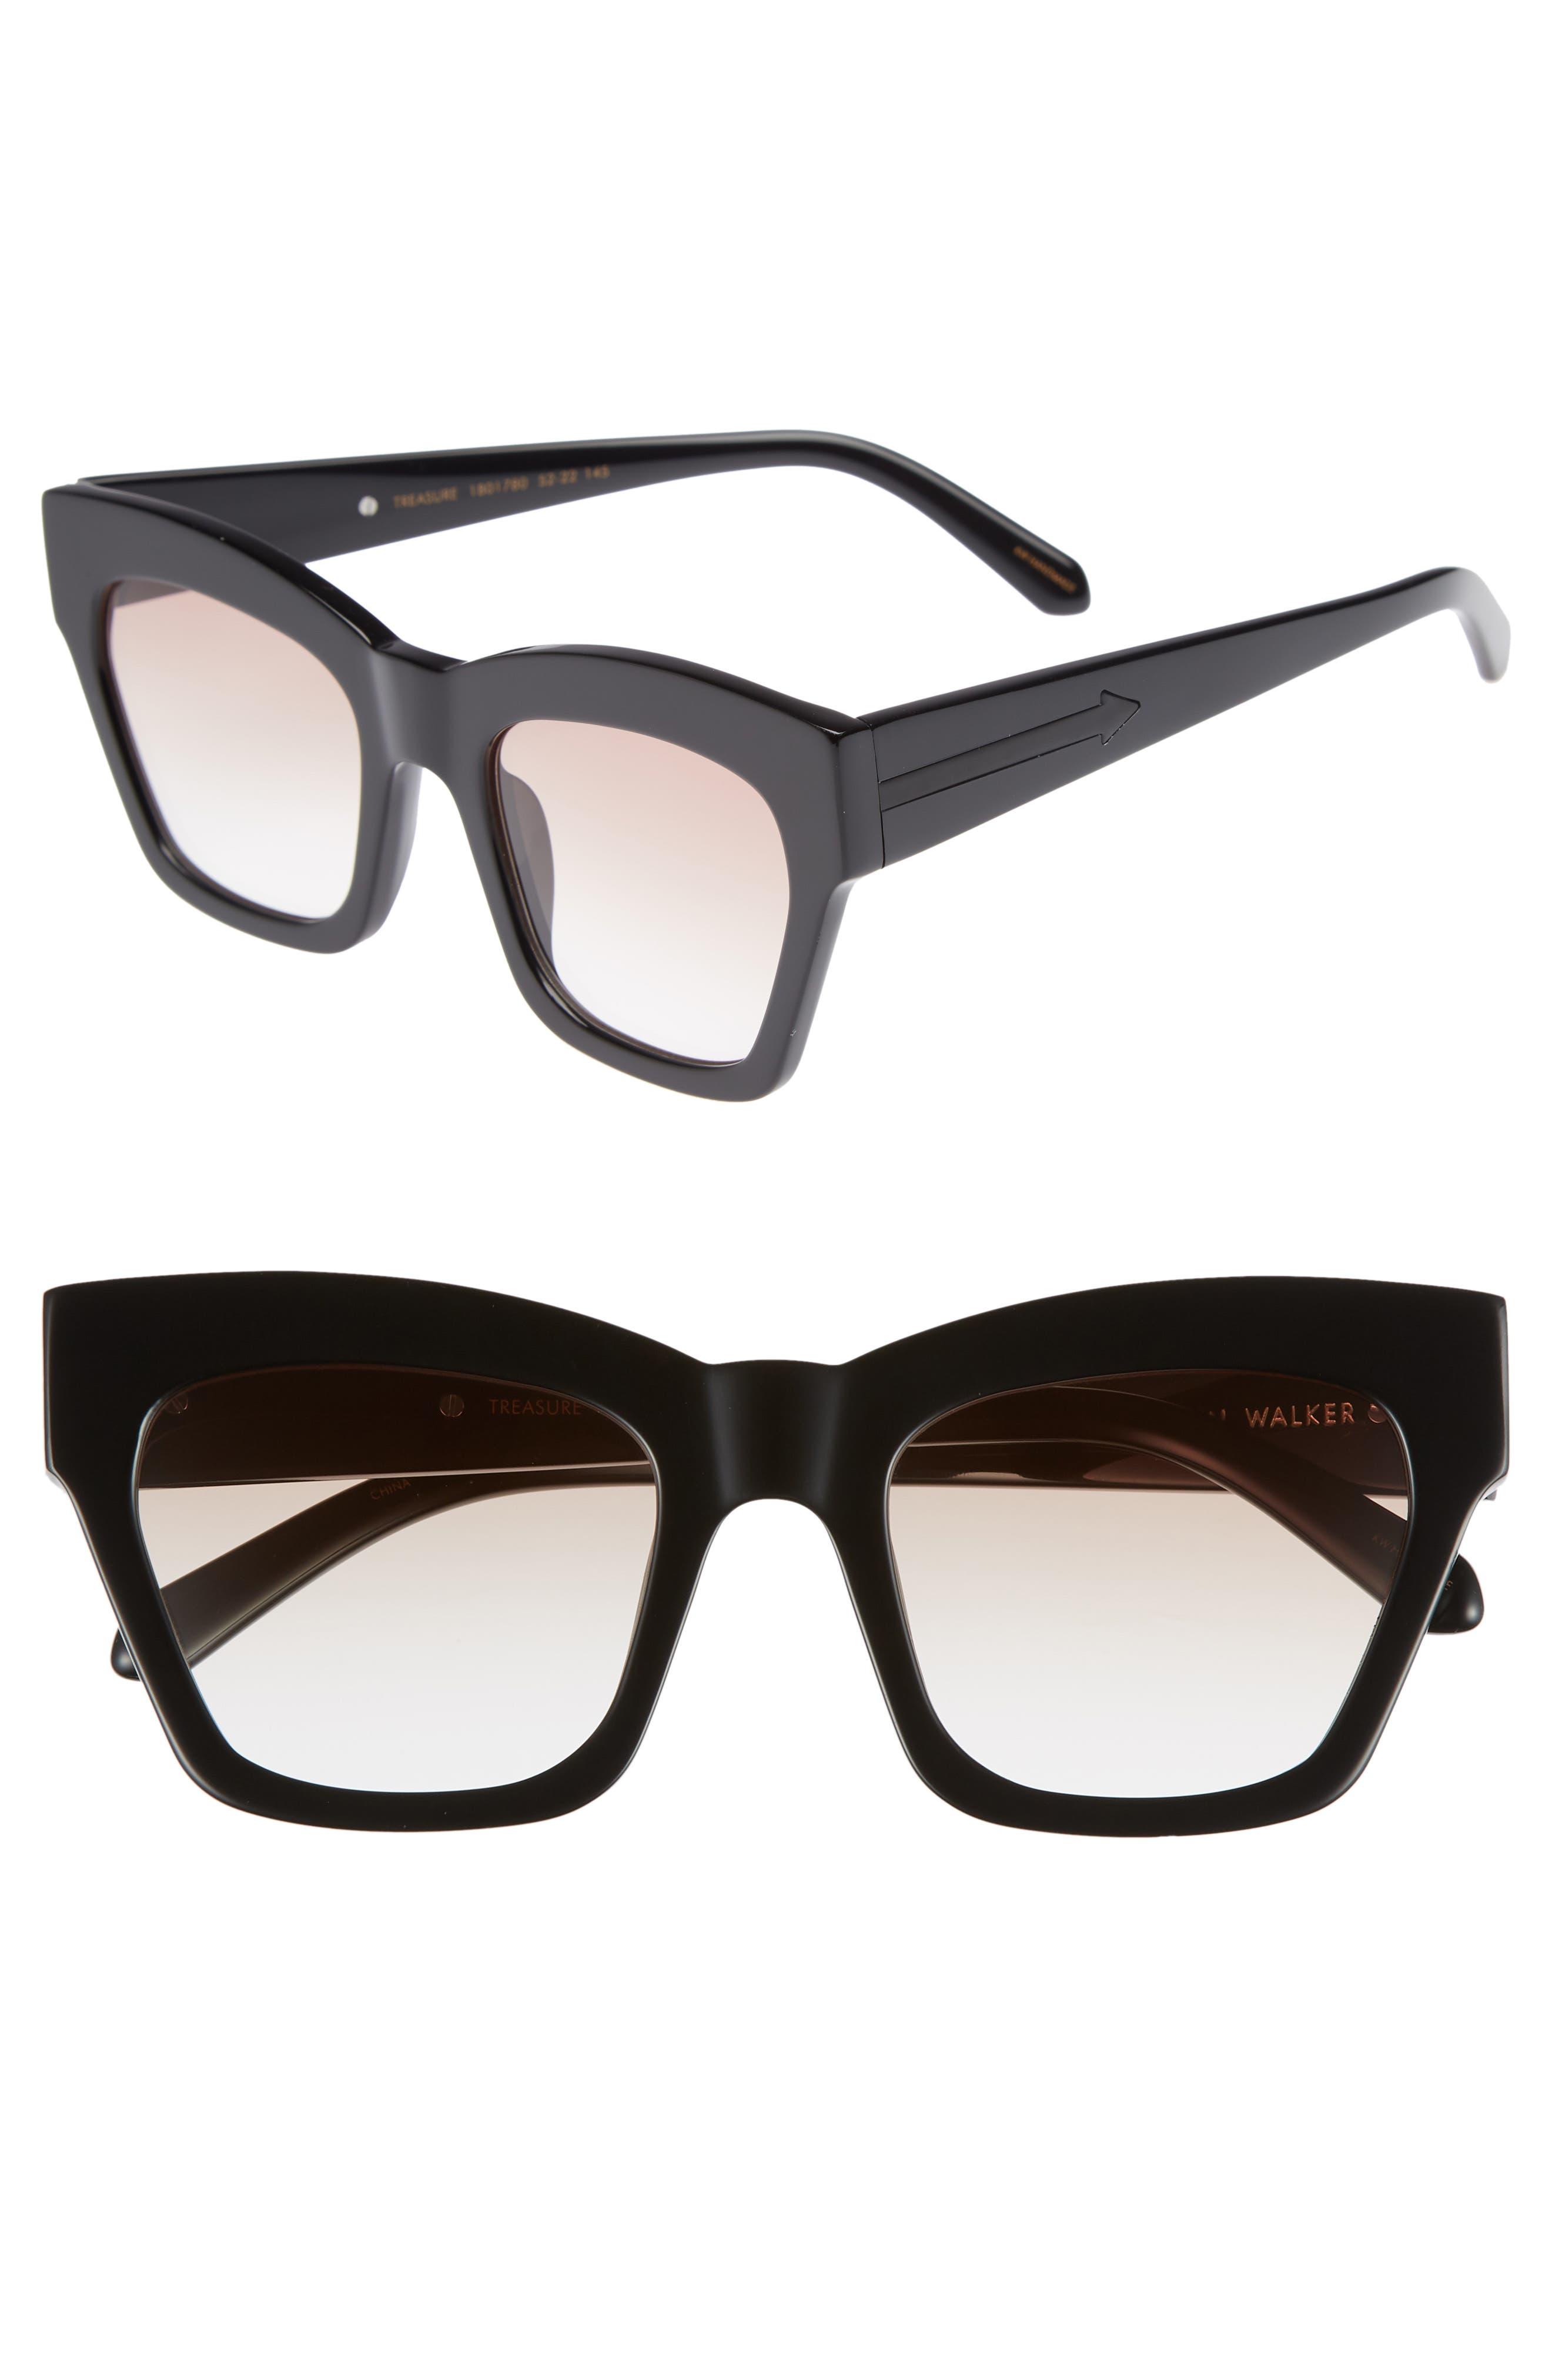 Treasure 52mm Cat Eye Sunglasses,                         Main,                         color, Shiny Black/ Brown